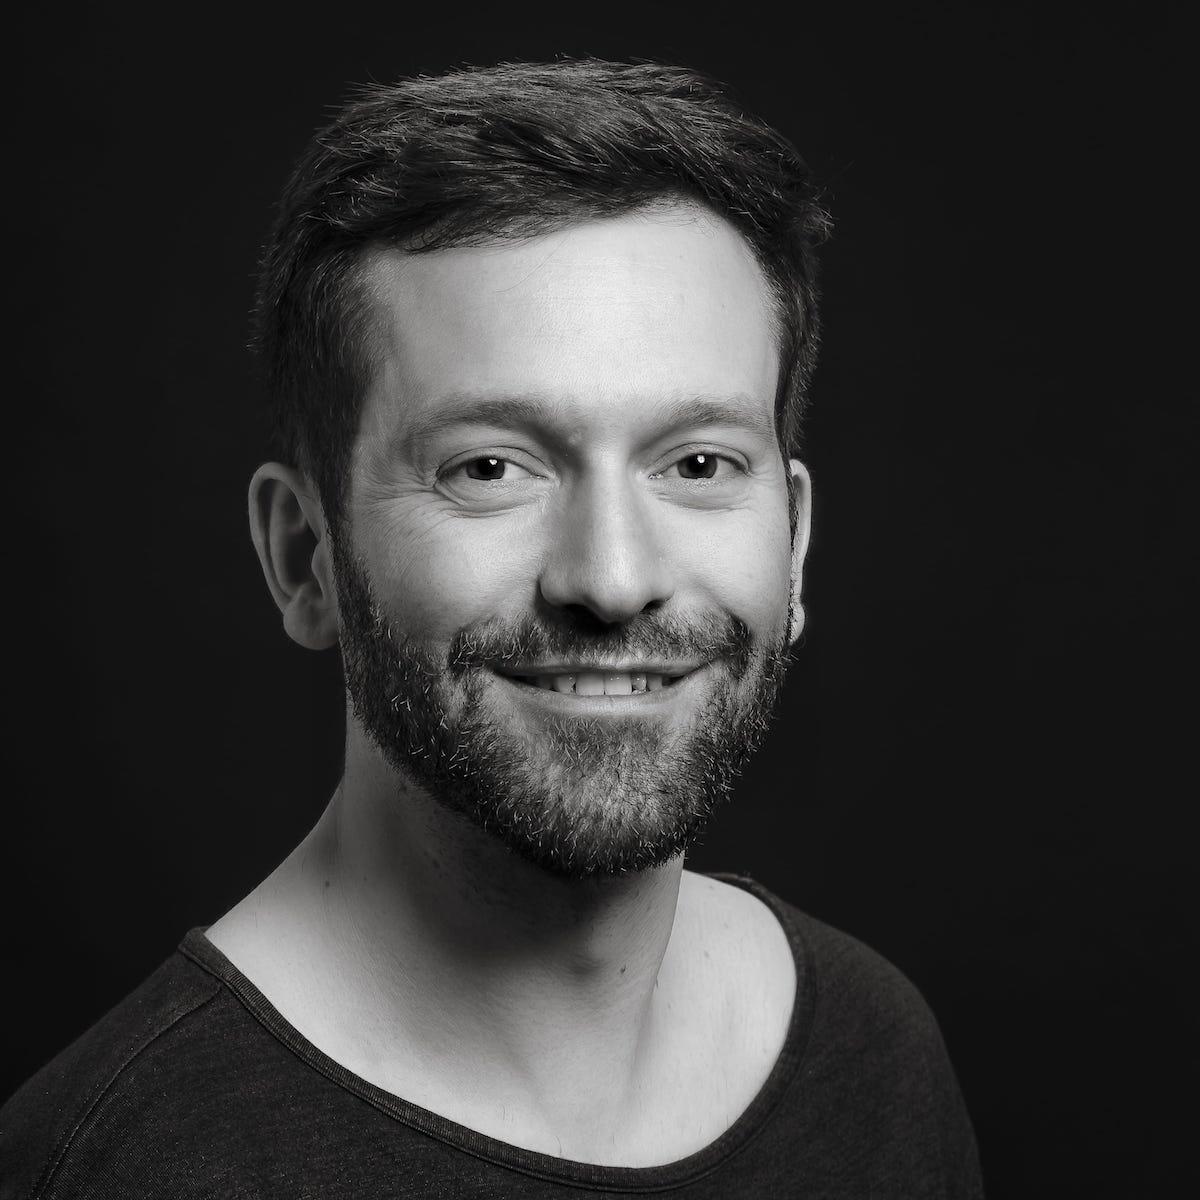 Valentin Behringer